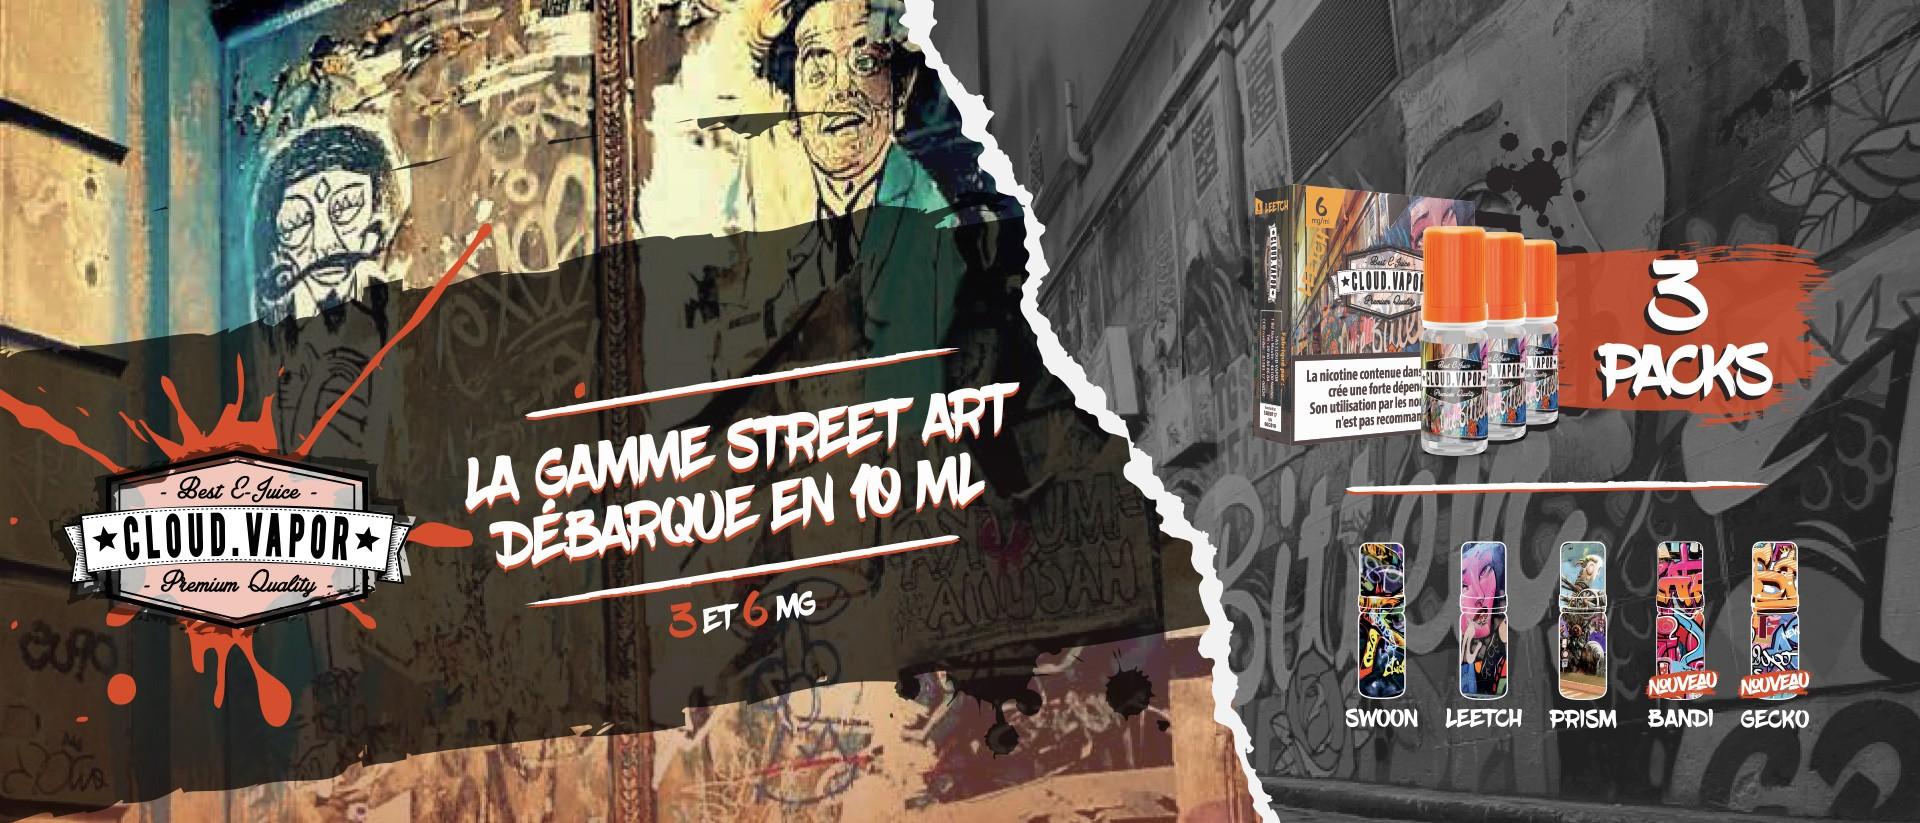 La gamme Street Art débarque en 3X10ML !